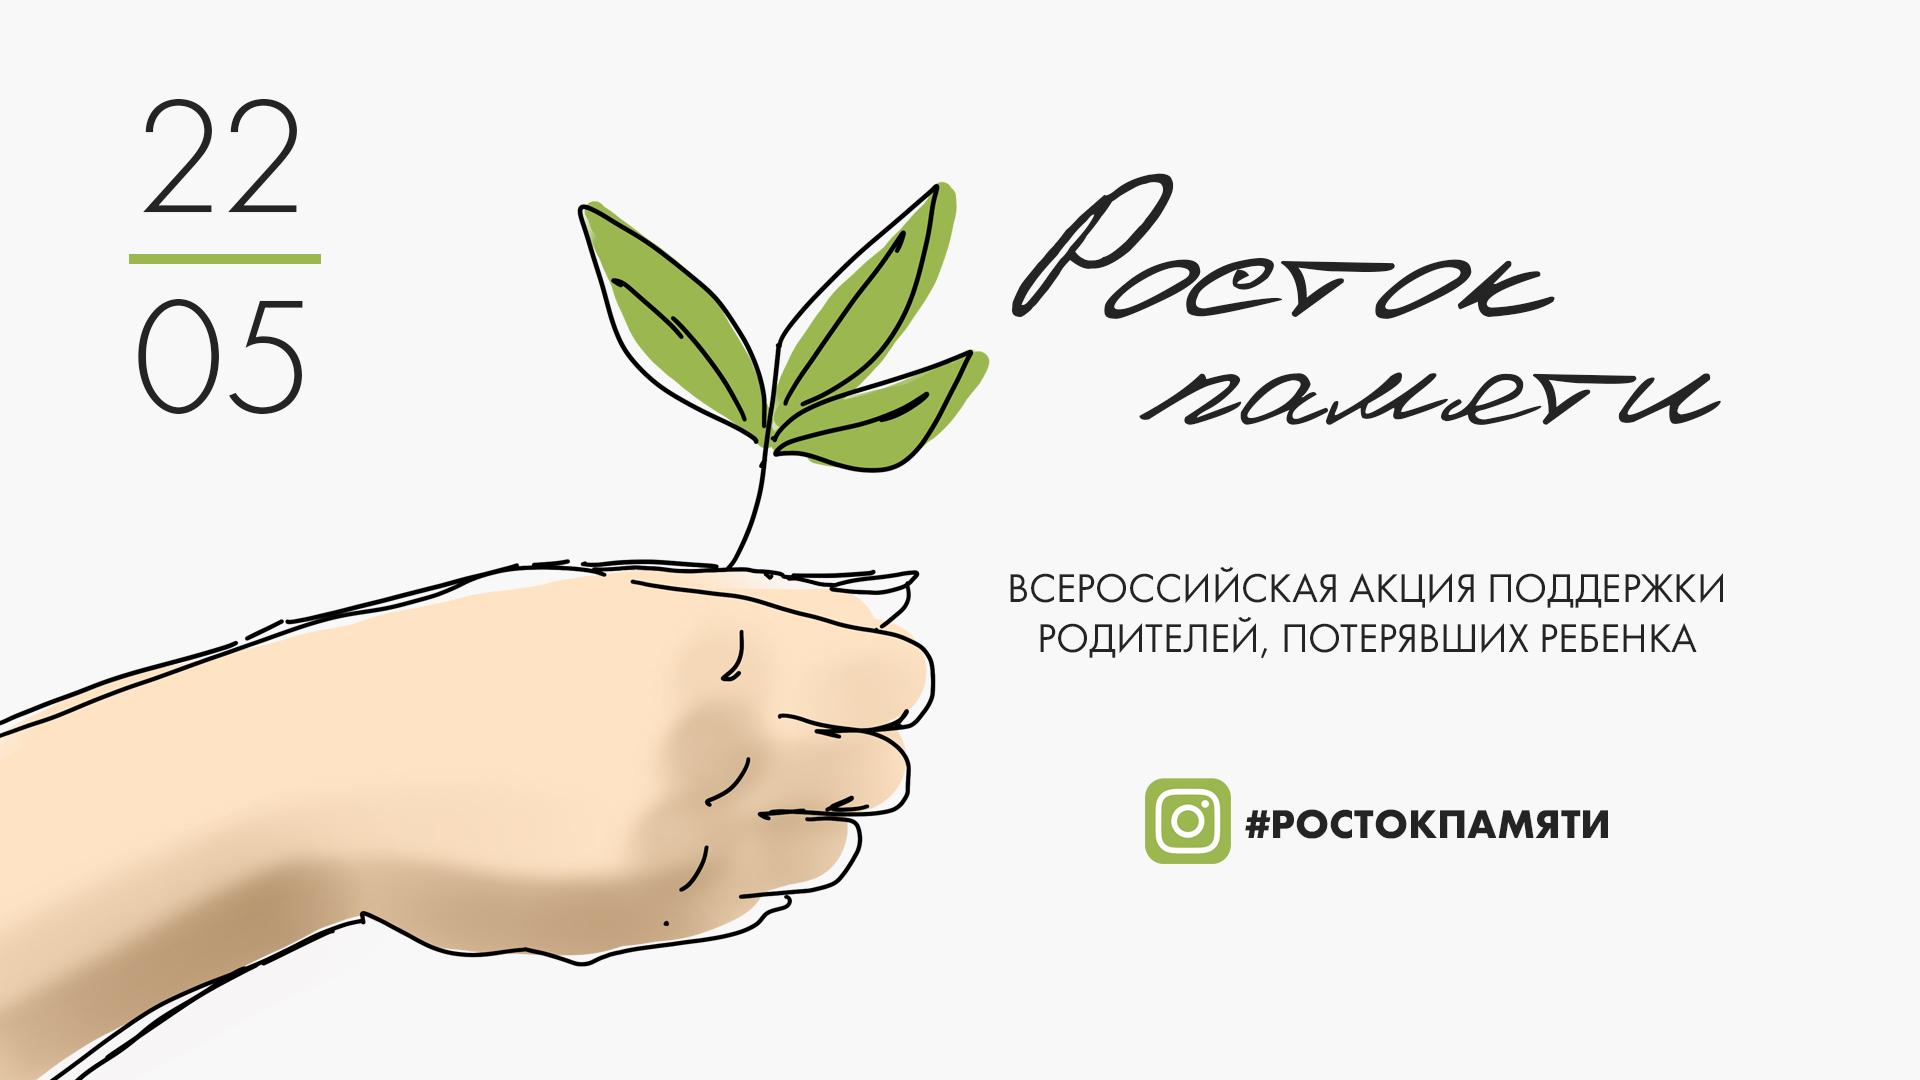 Макет РП